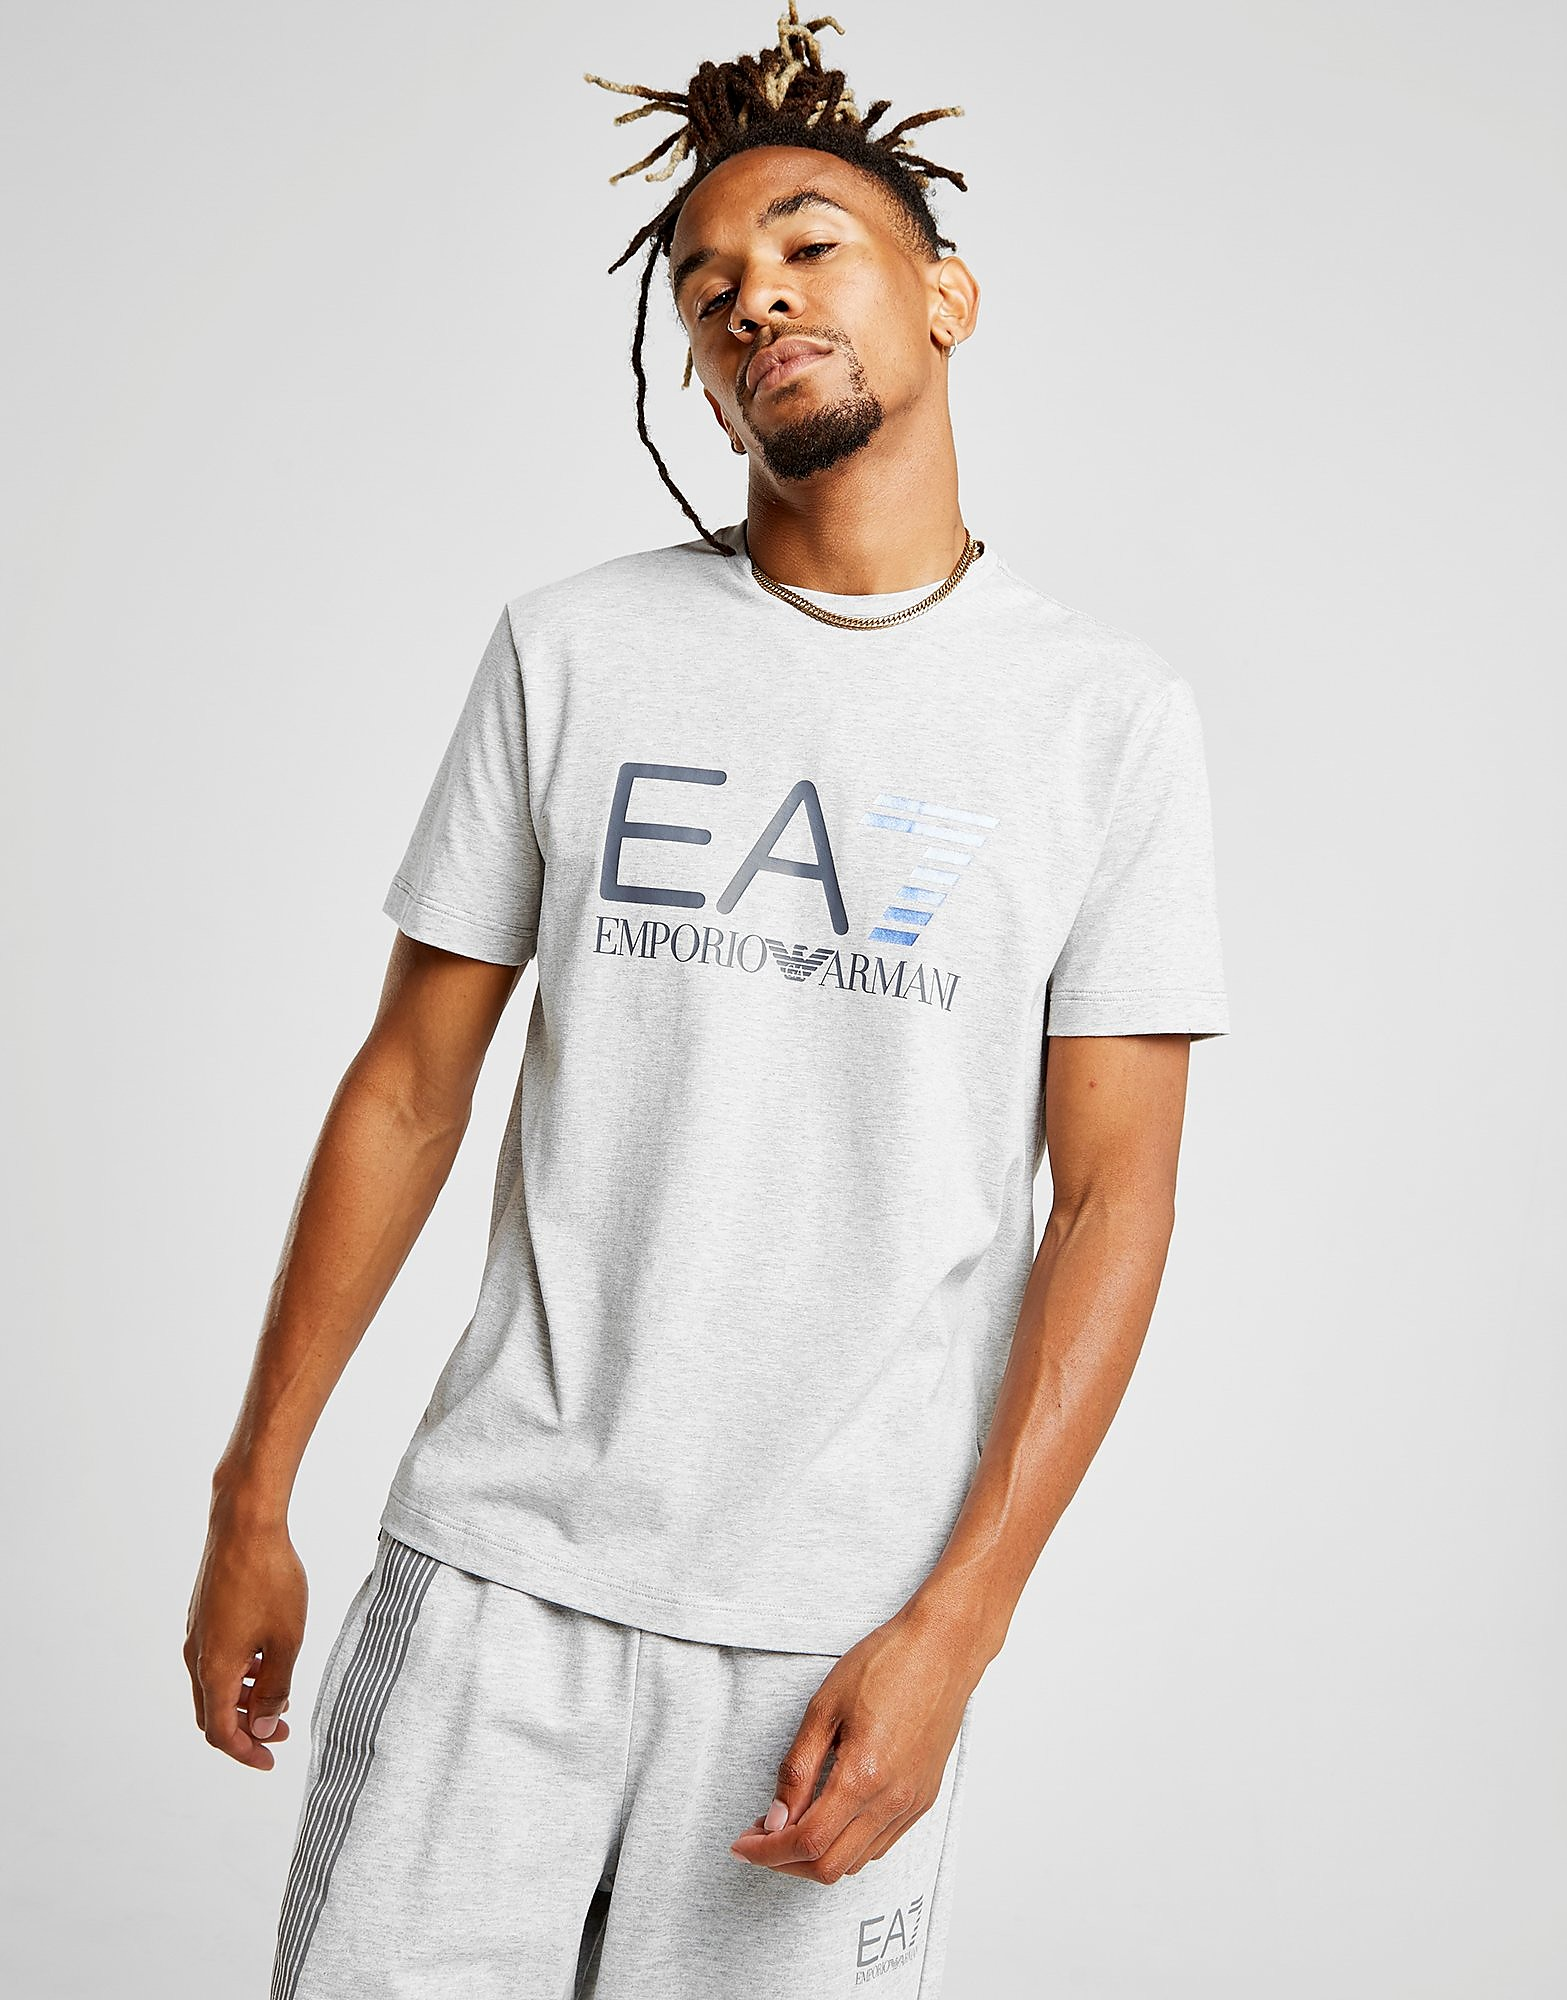 Emporio Armani EA7 Large Central Logo T-Shirt